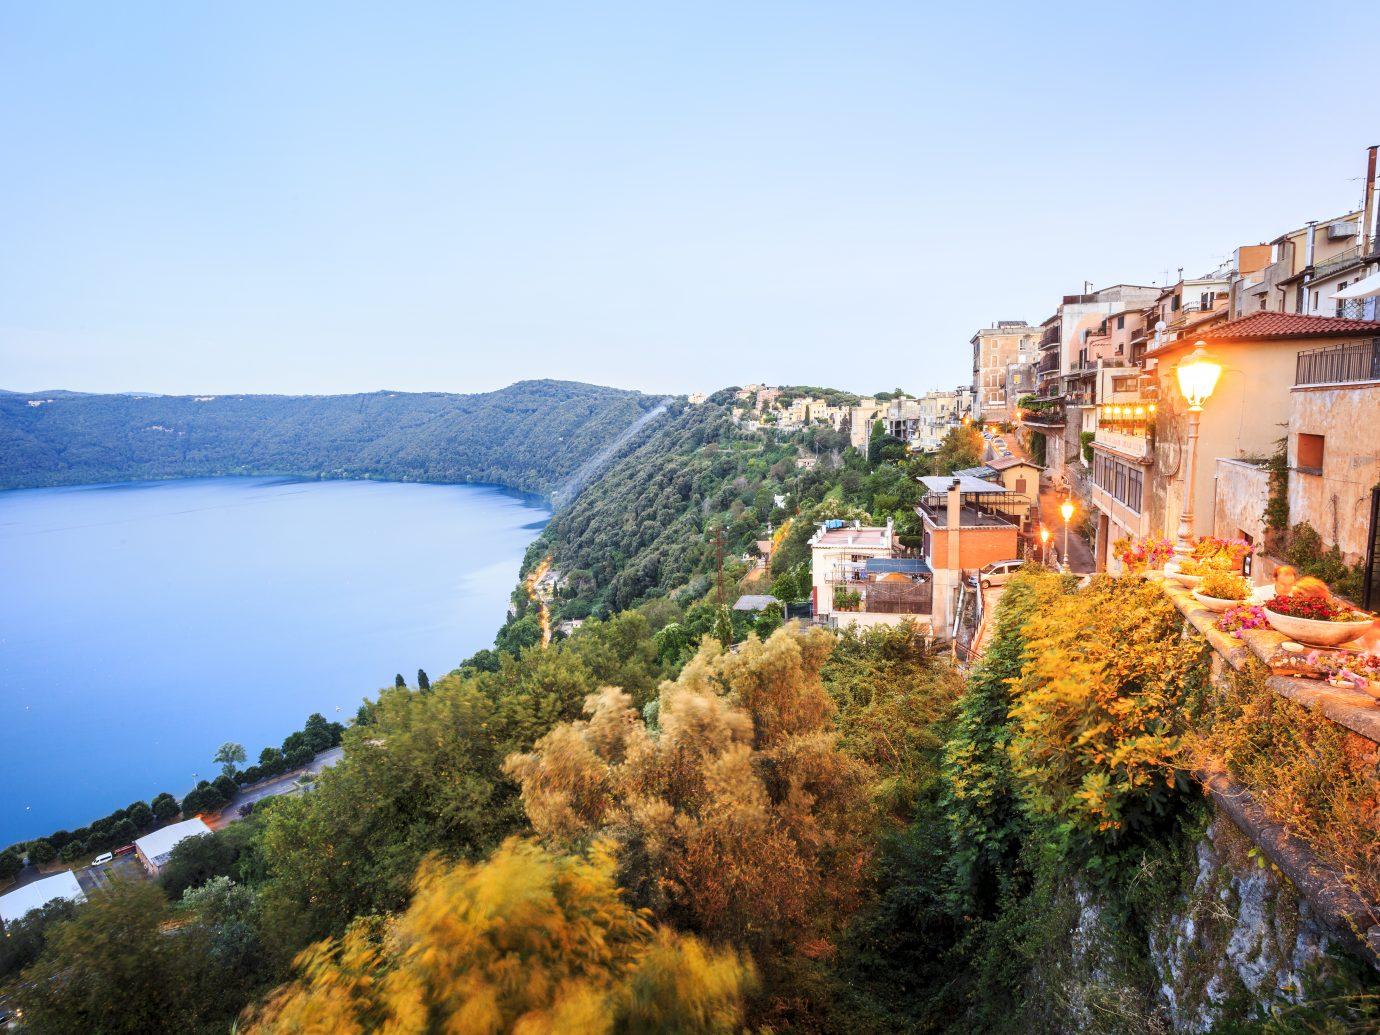 Albano Lake shore and city of Castel Gandolfo, Lazio, Italy